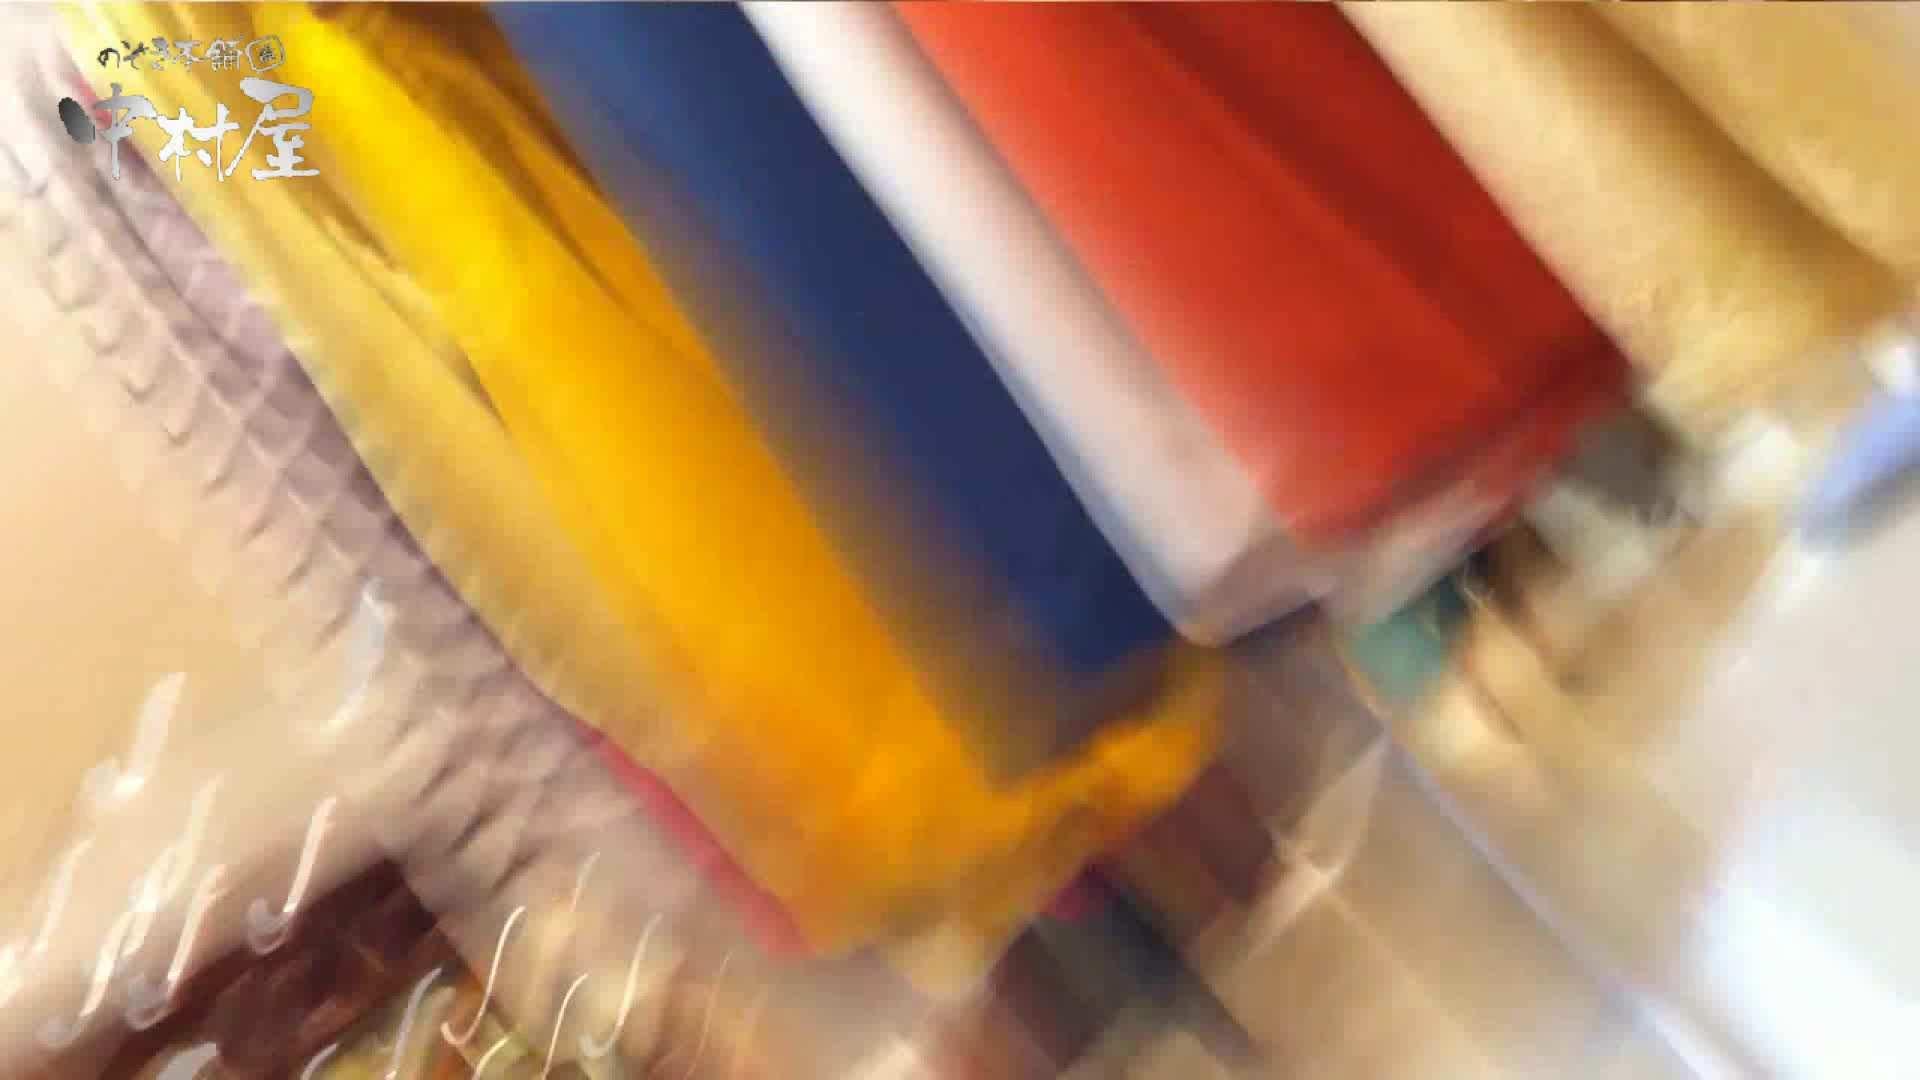 vol.47 カリスマ店員胸チラ&パンチラ 黒パン店員さん 胸チラ おめこ無修正動画無料 79連発 19